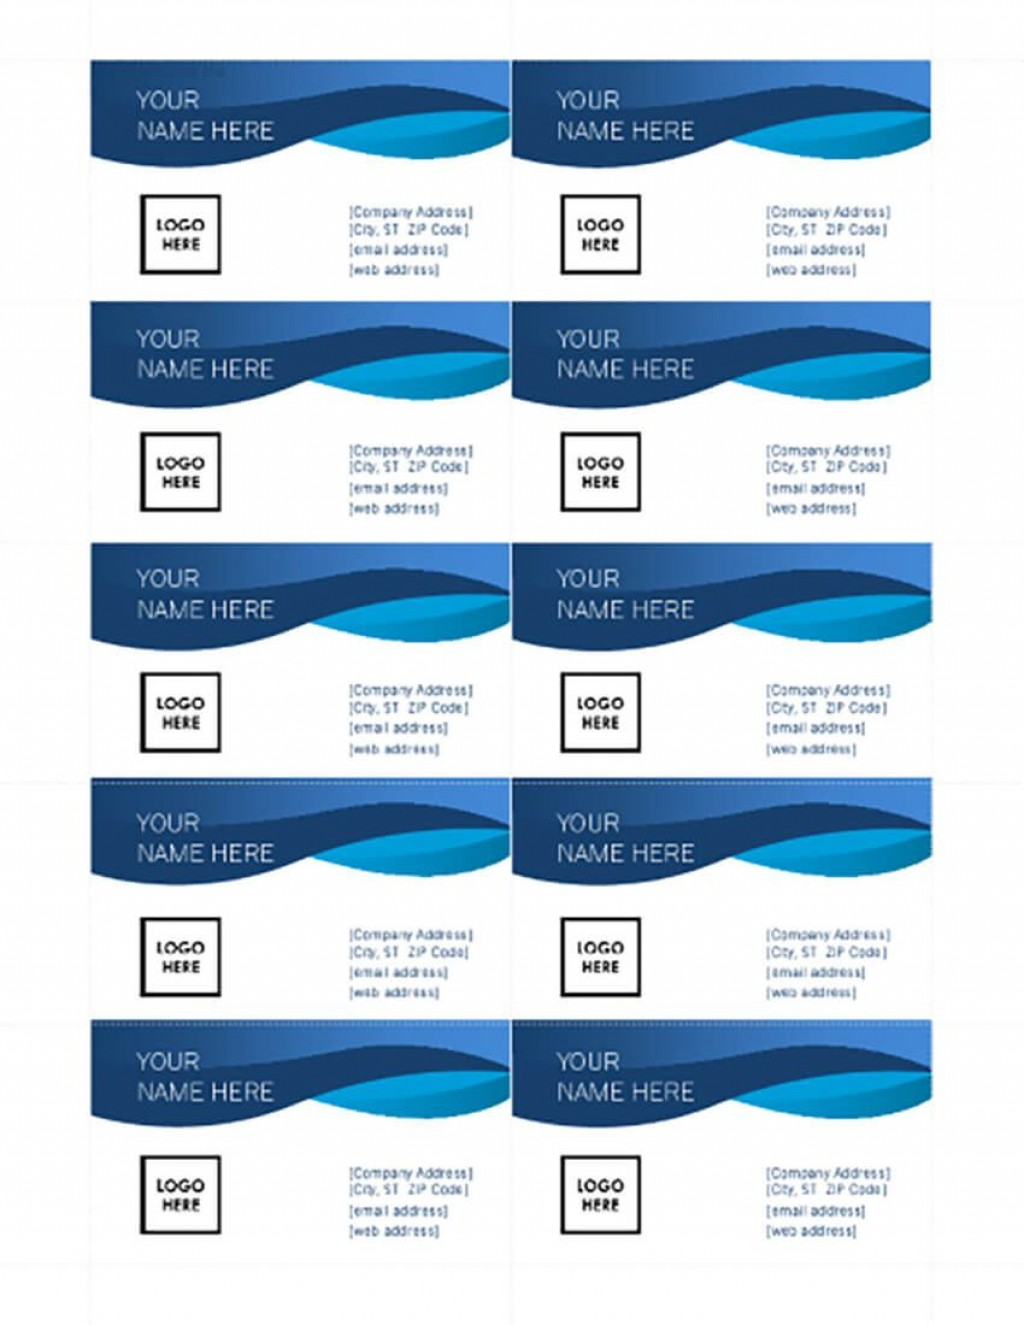 008 Singular Busines Card Template Microsoft Word 2010 Photo Large